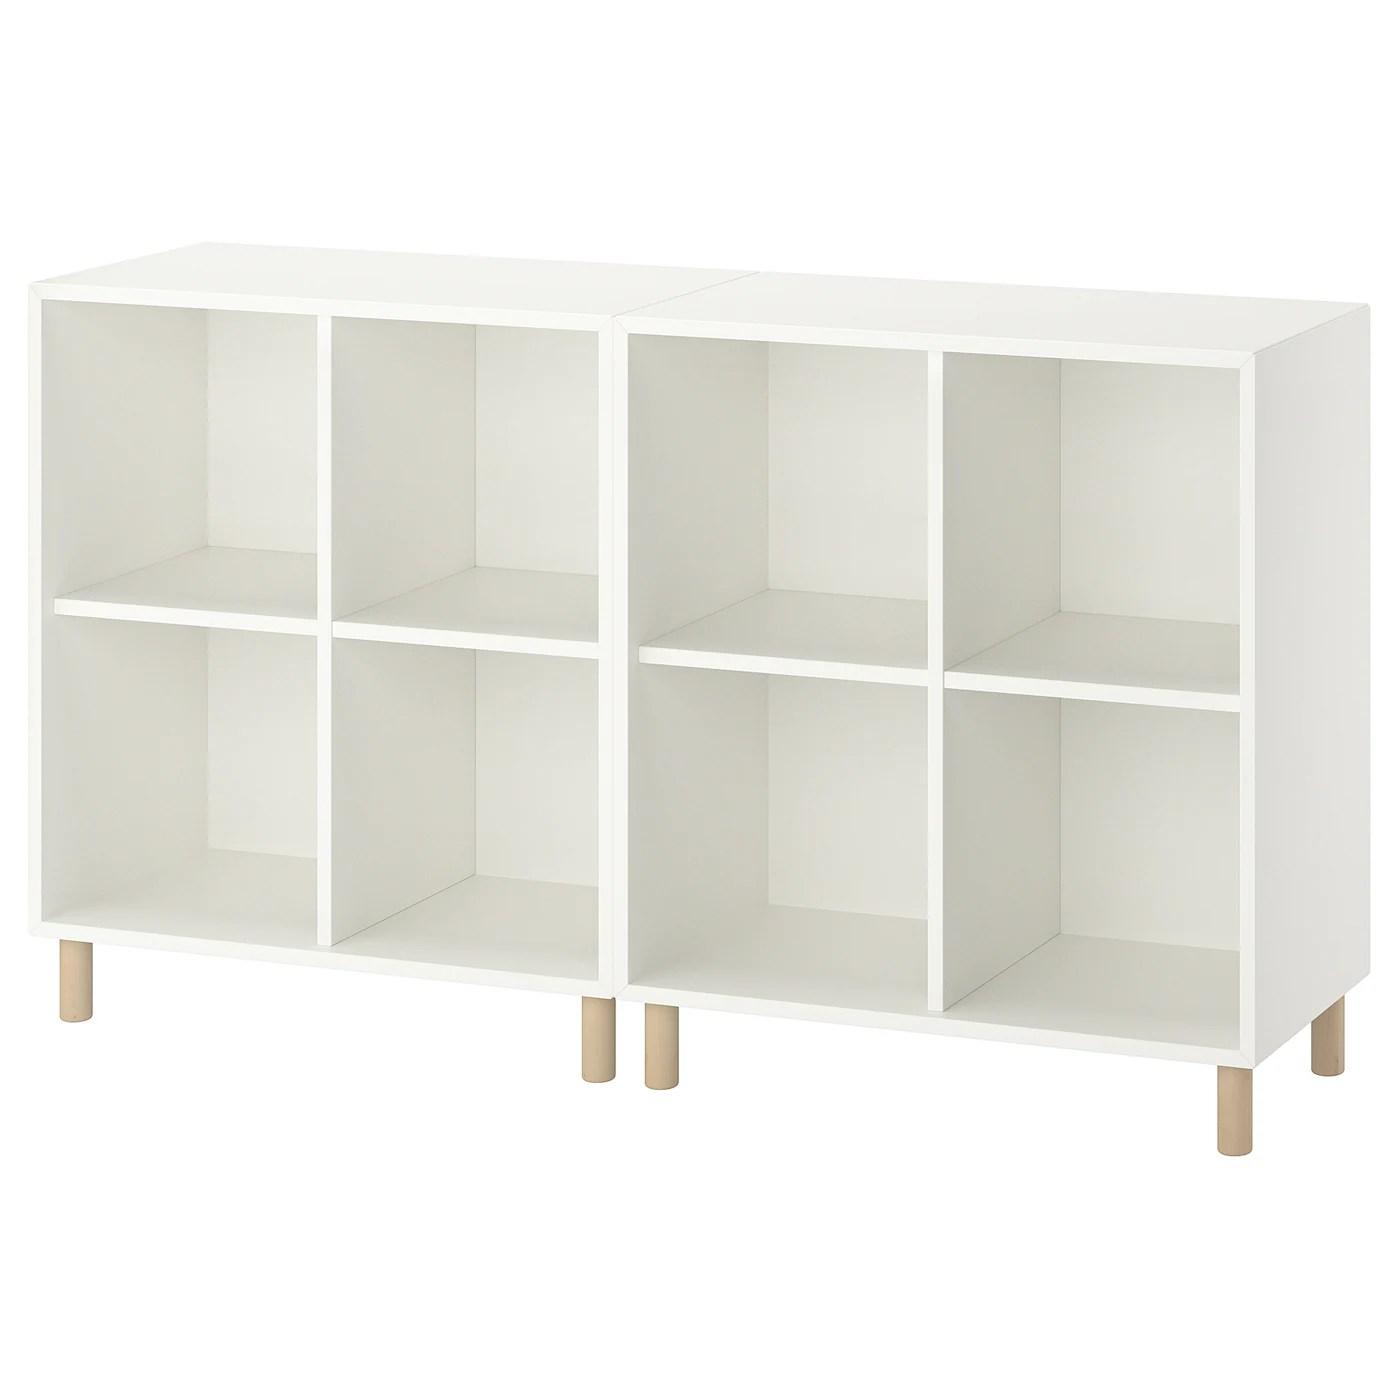 Cube Storage Ikea